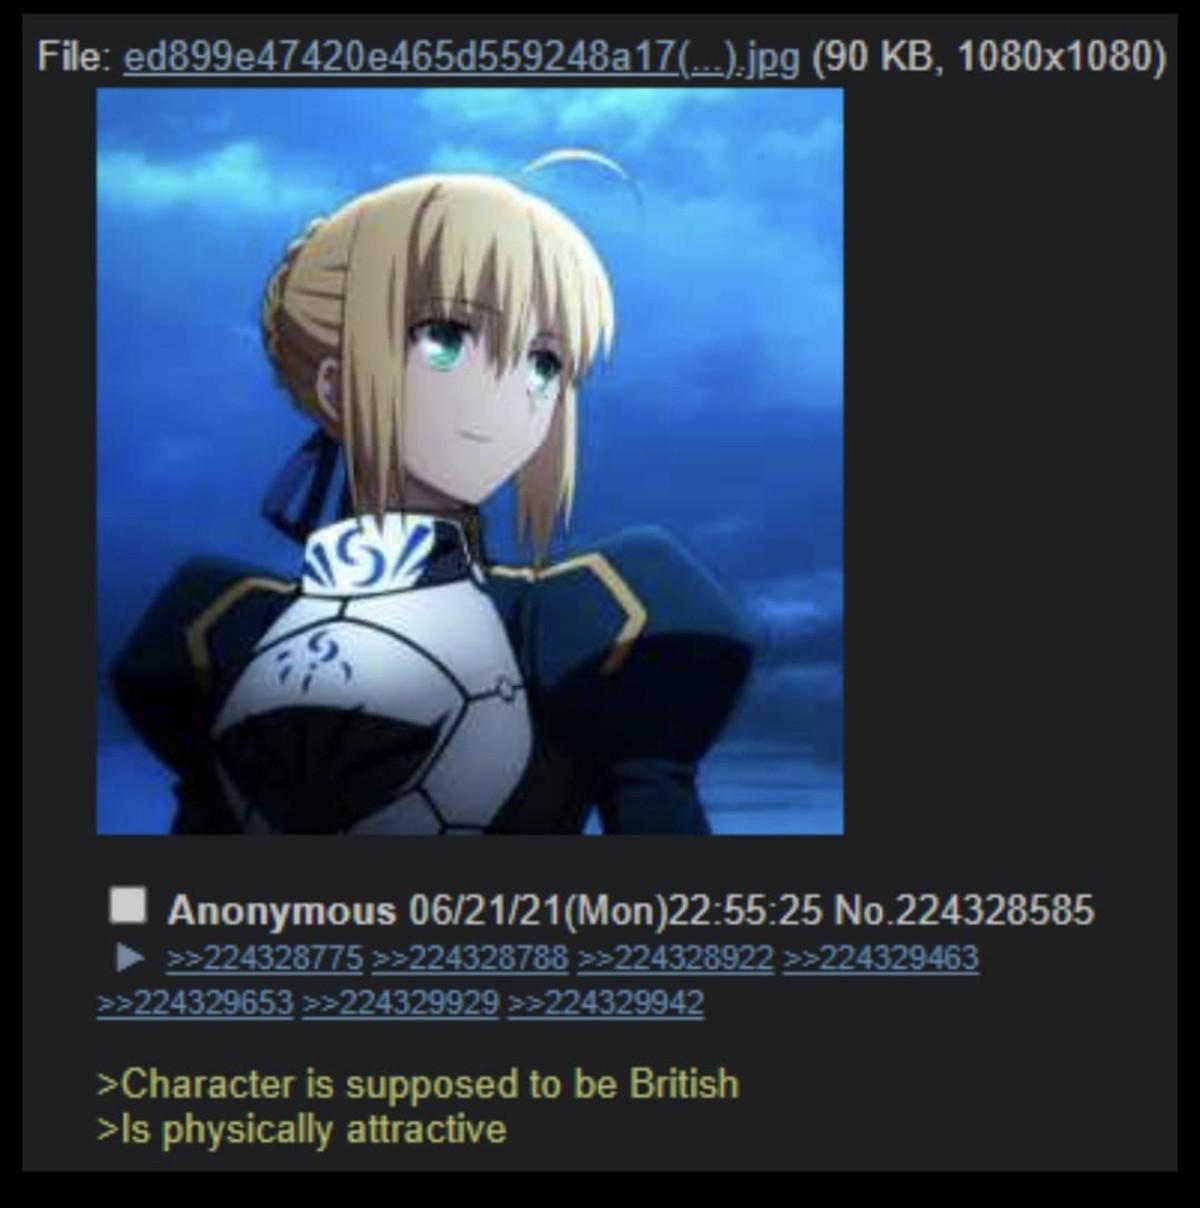 BRITISH SLANDER. Racism will not be tolerated in sasuke sama's utopia.. Isnt she welsh?